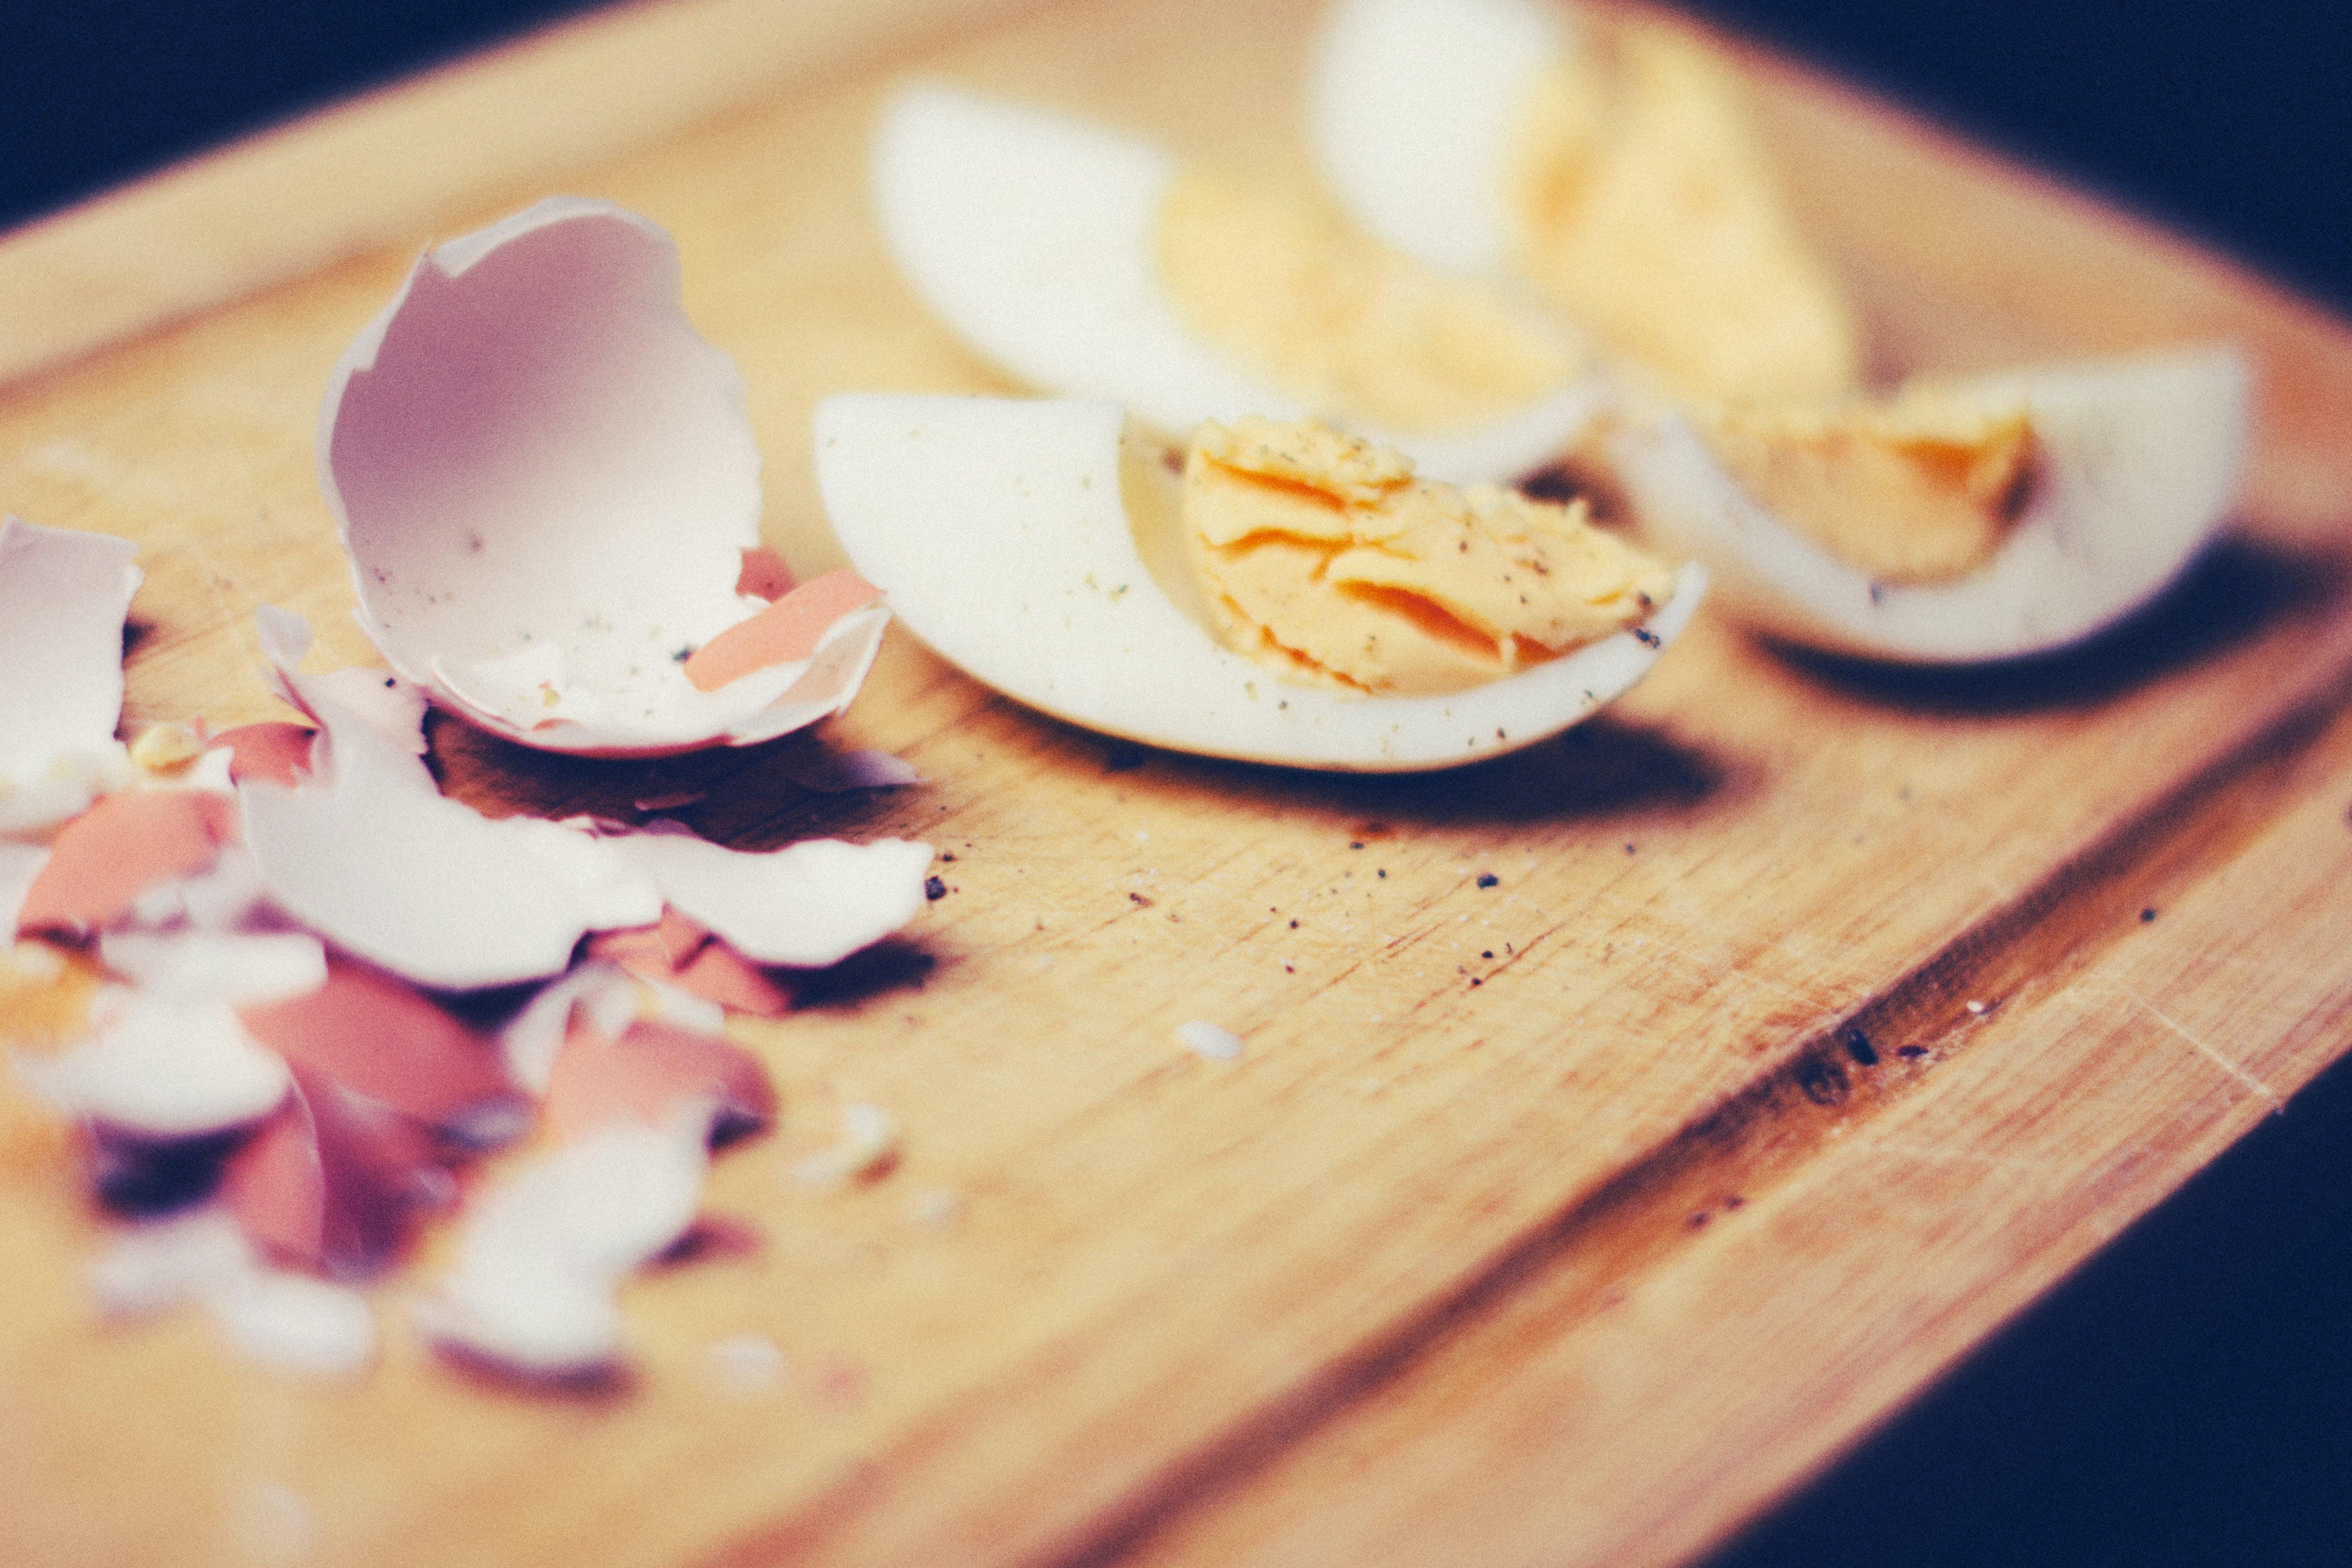 Sliced Egg and Eggshells